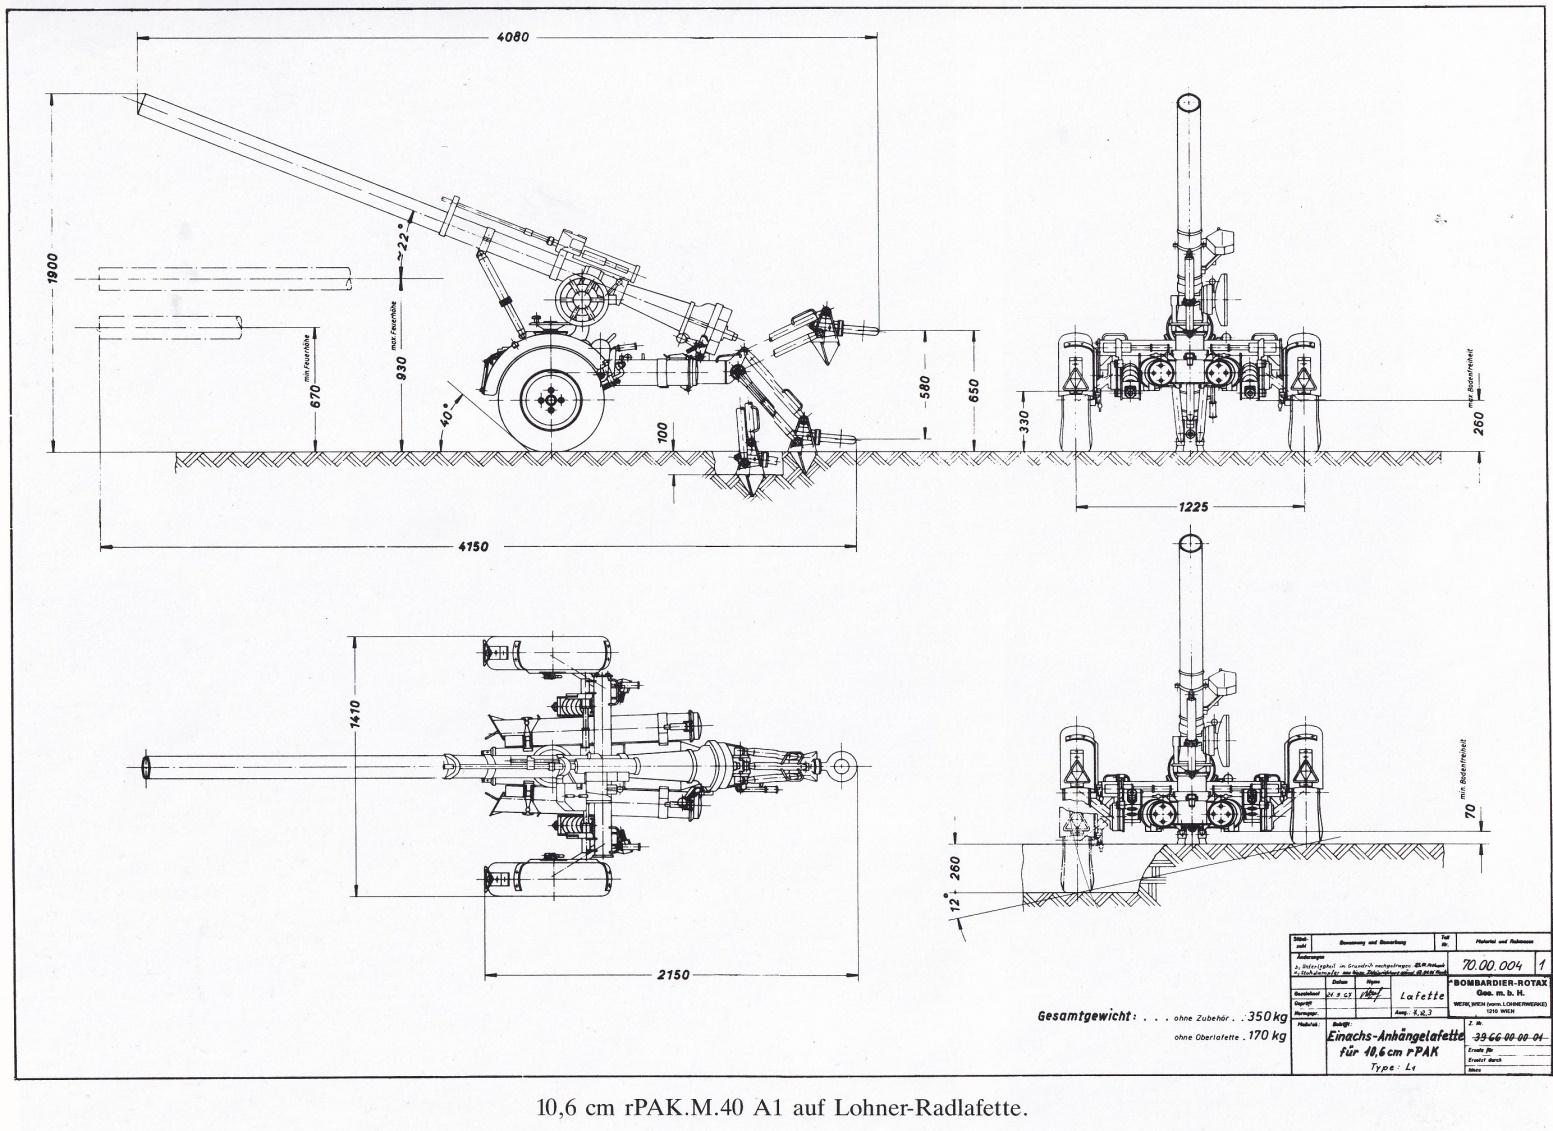 D:\Archiv Nemeth\Fzg-Gerät-Ausrüstung\Fahrzeuge\Mehrspurige Kfz\BH Fahrzeuge\Jeep\rPak\M66\Plan.jpg